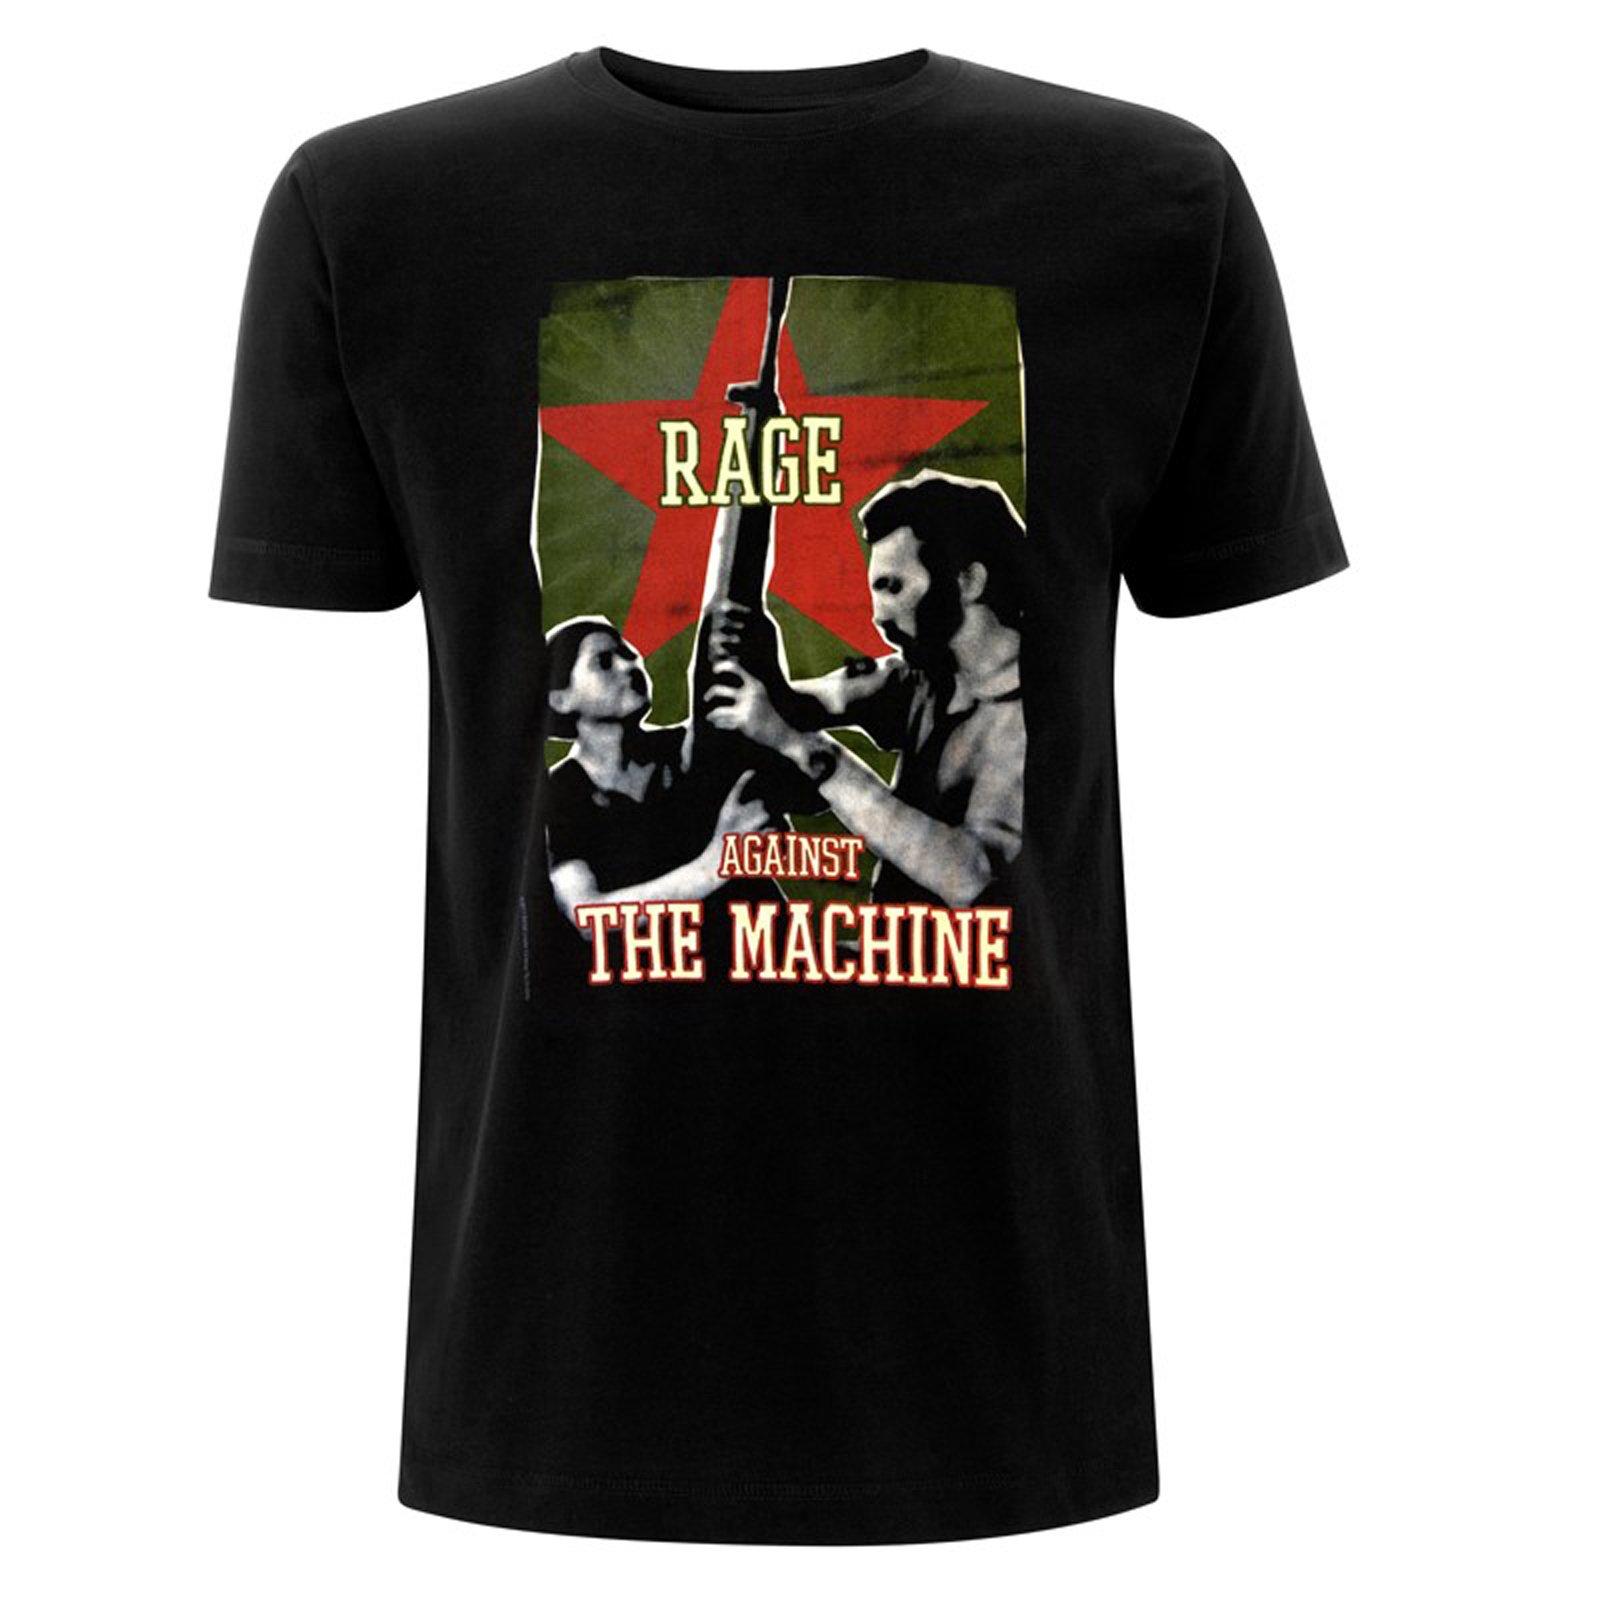 Rage Against The Machine Rifle Tom Morello Tee T Shirt S Unisex 9845